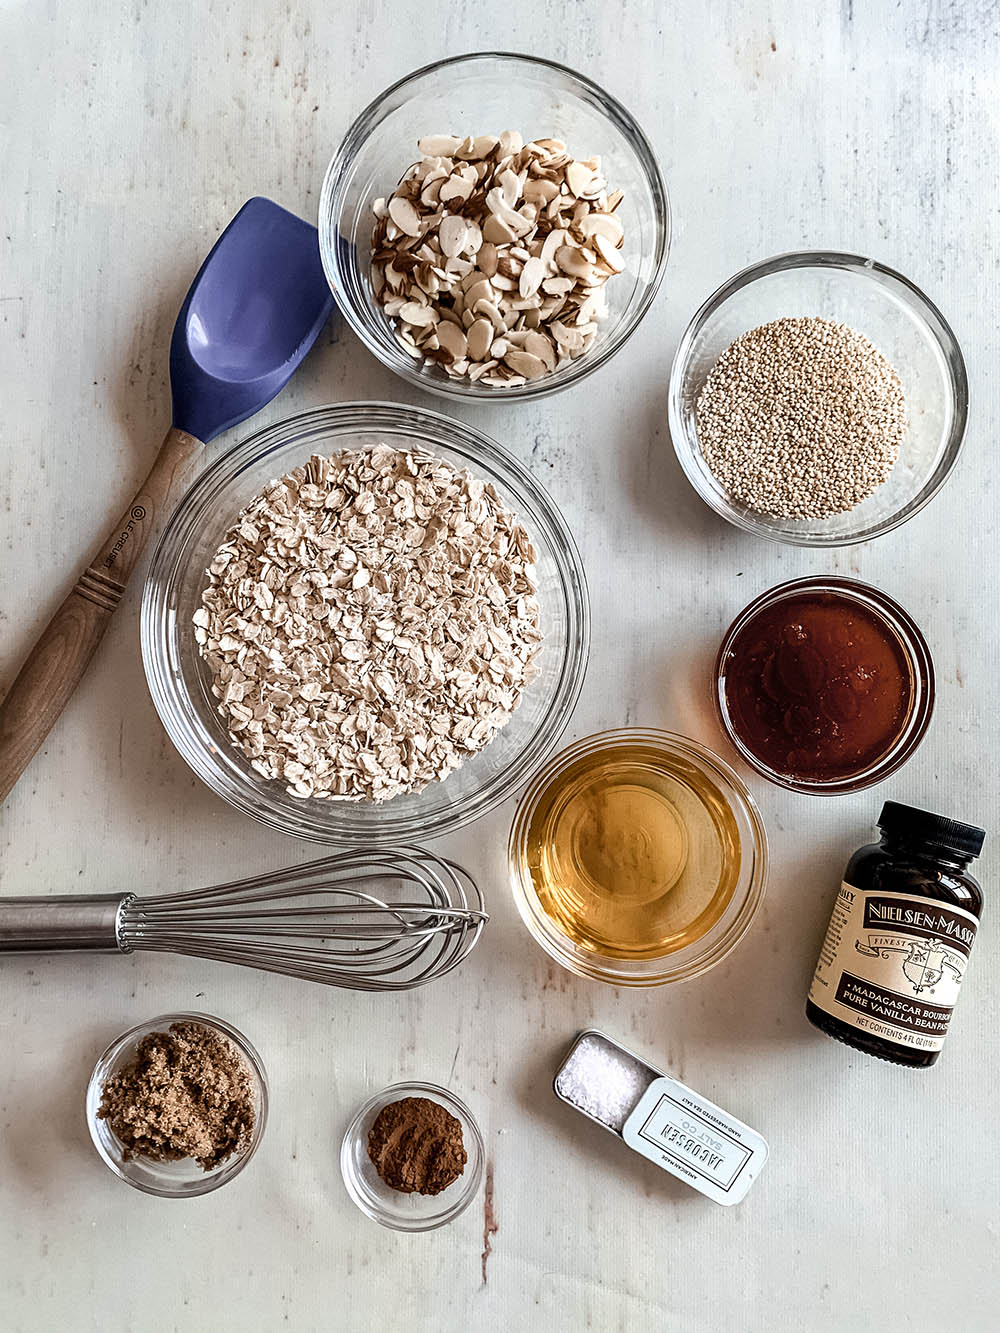 Vanilla Almond Granola ingredients.